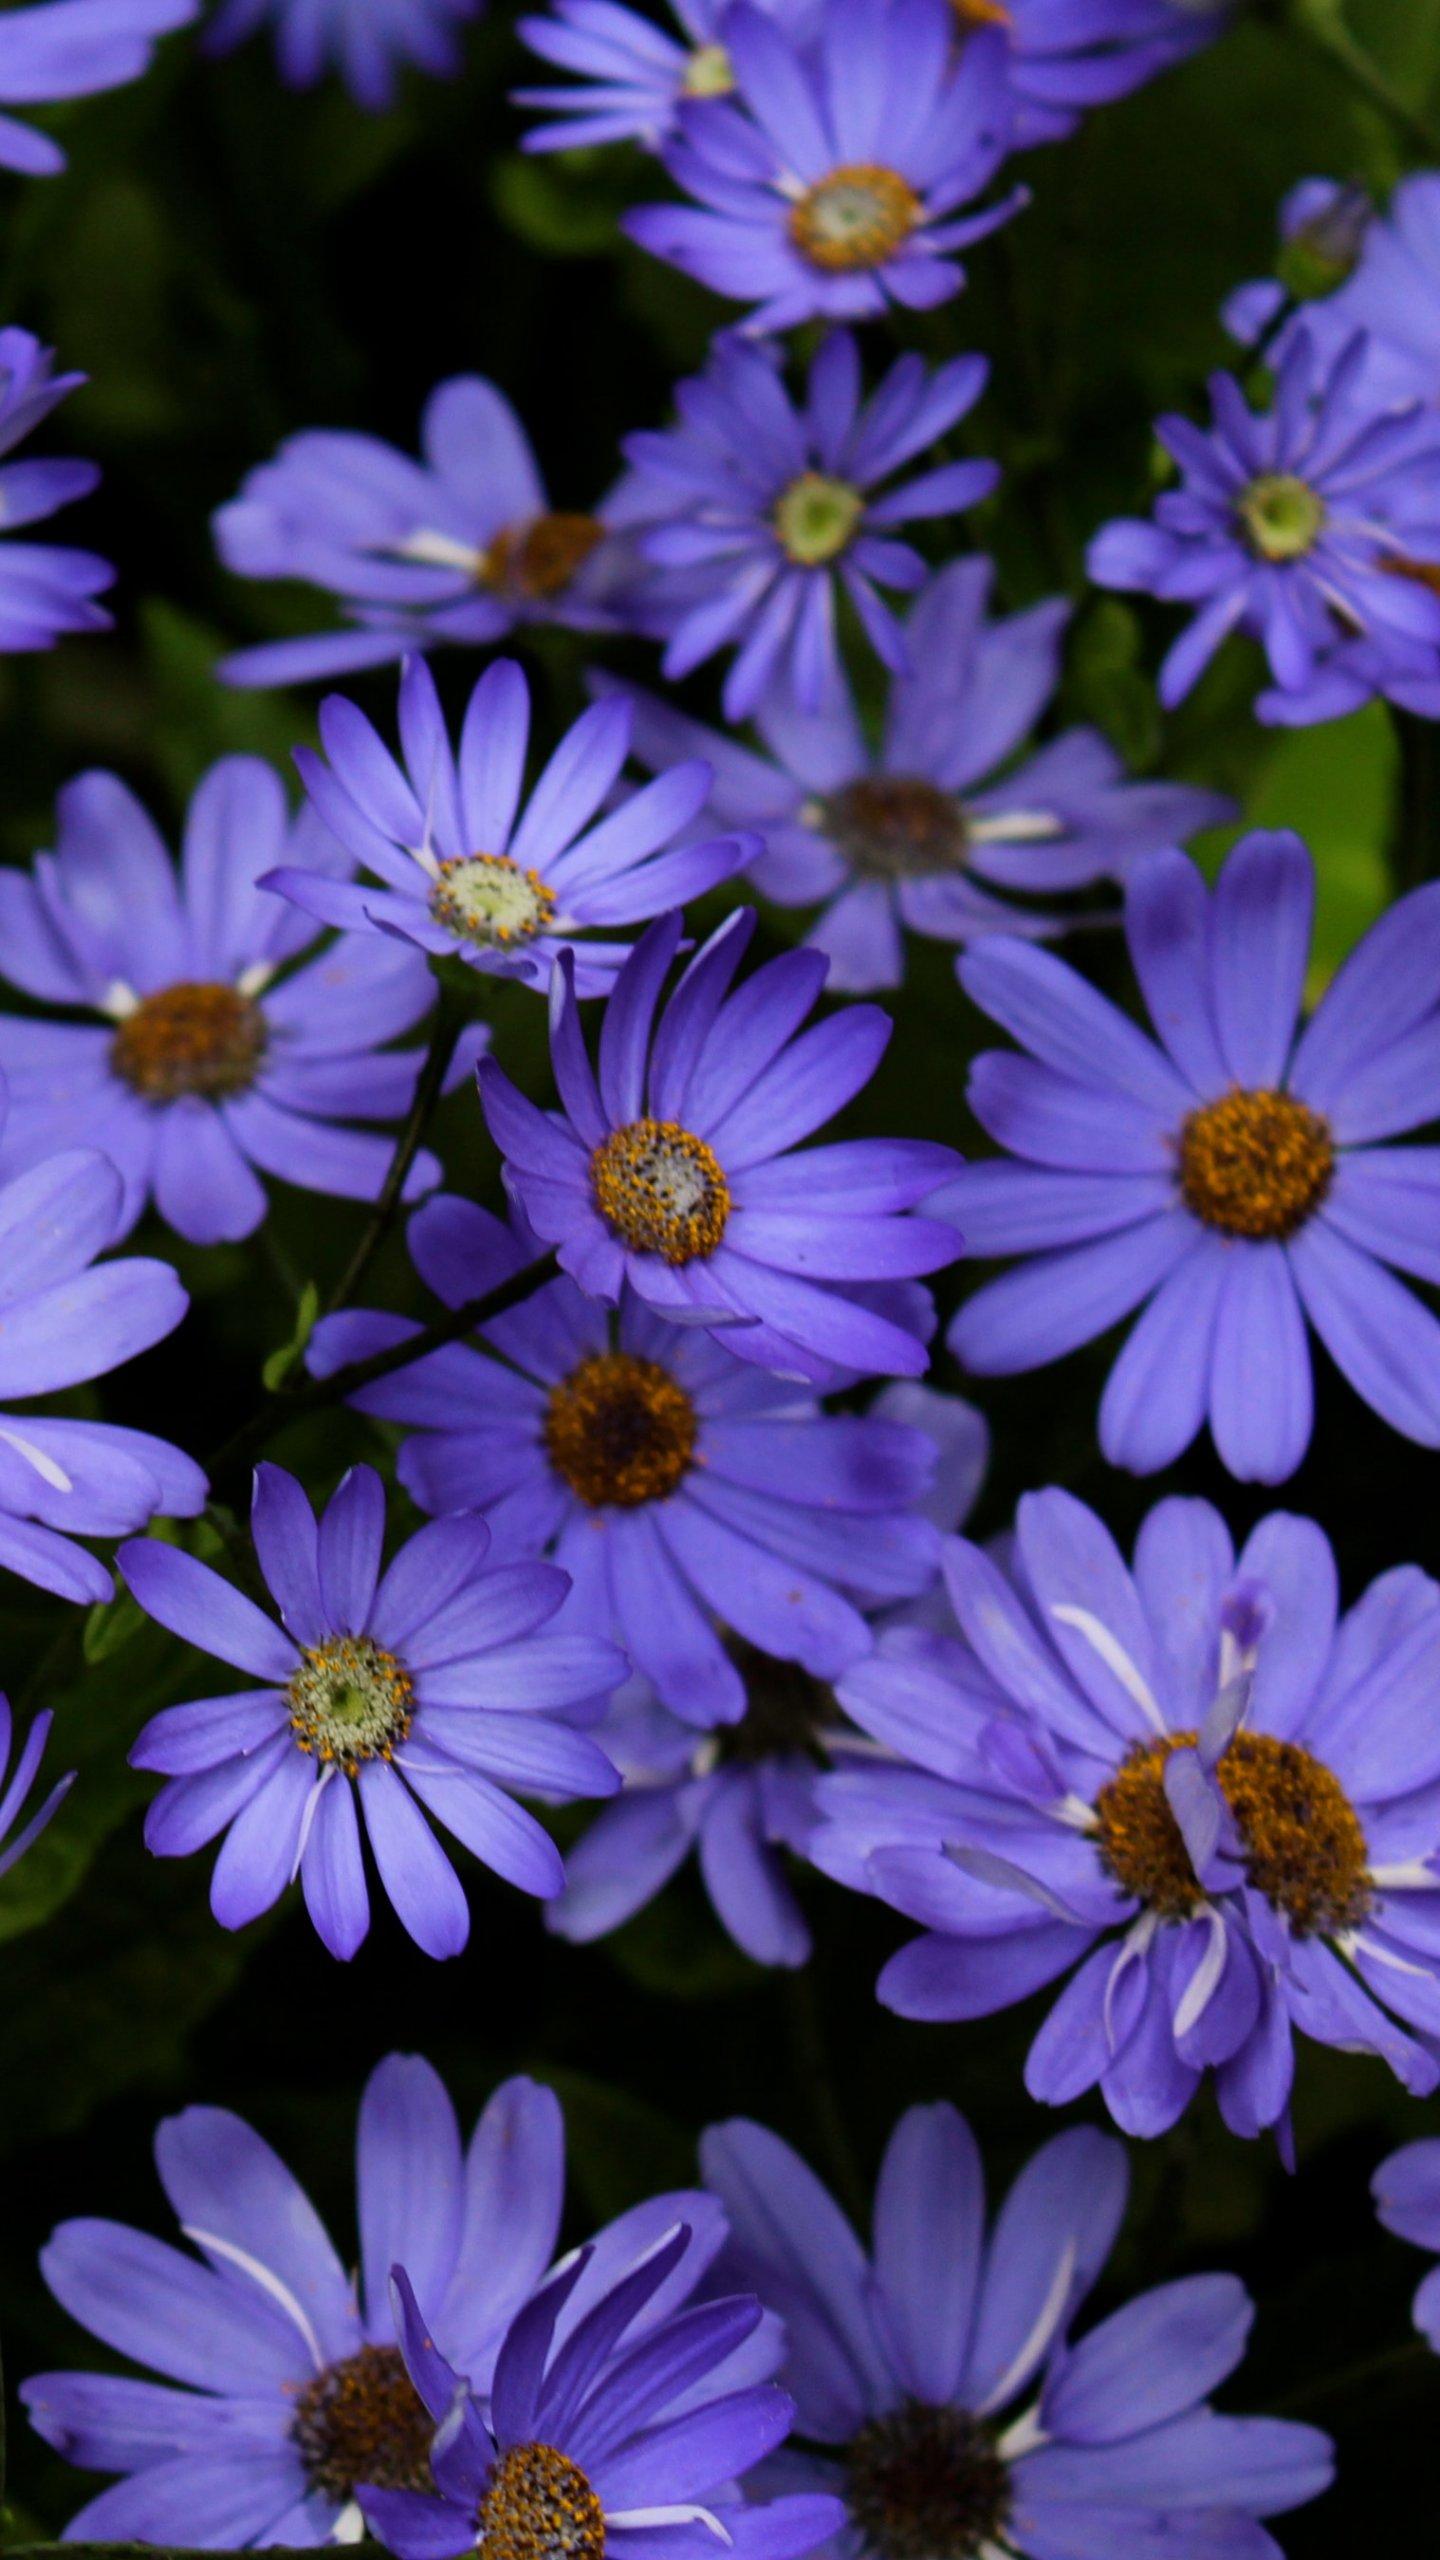 Purple Daisies Wallpaper